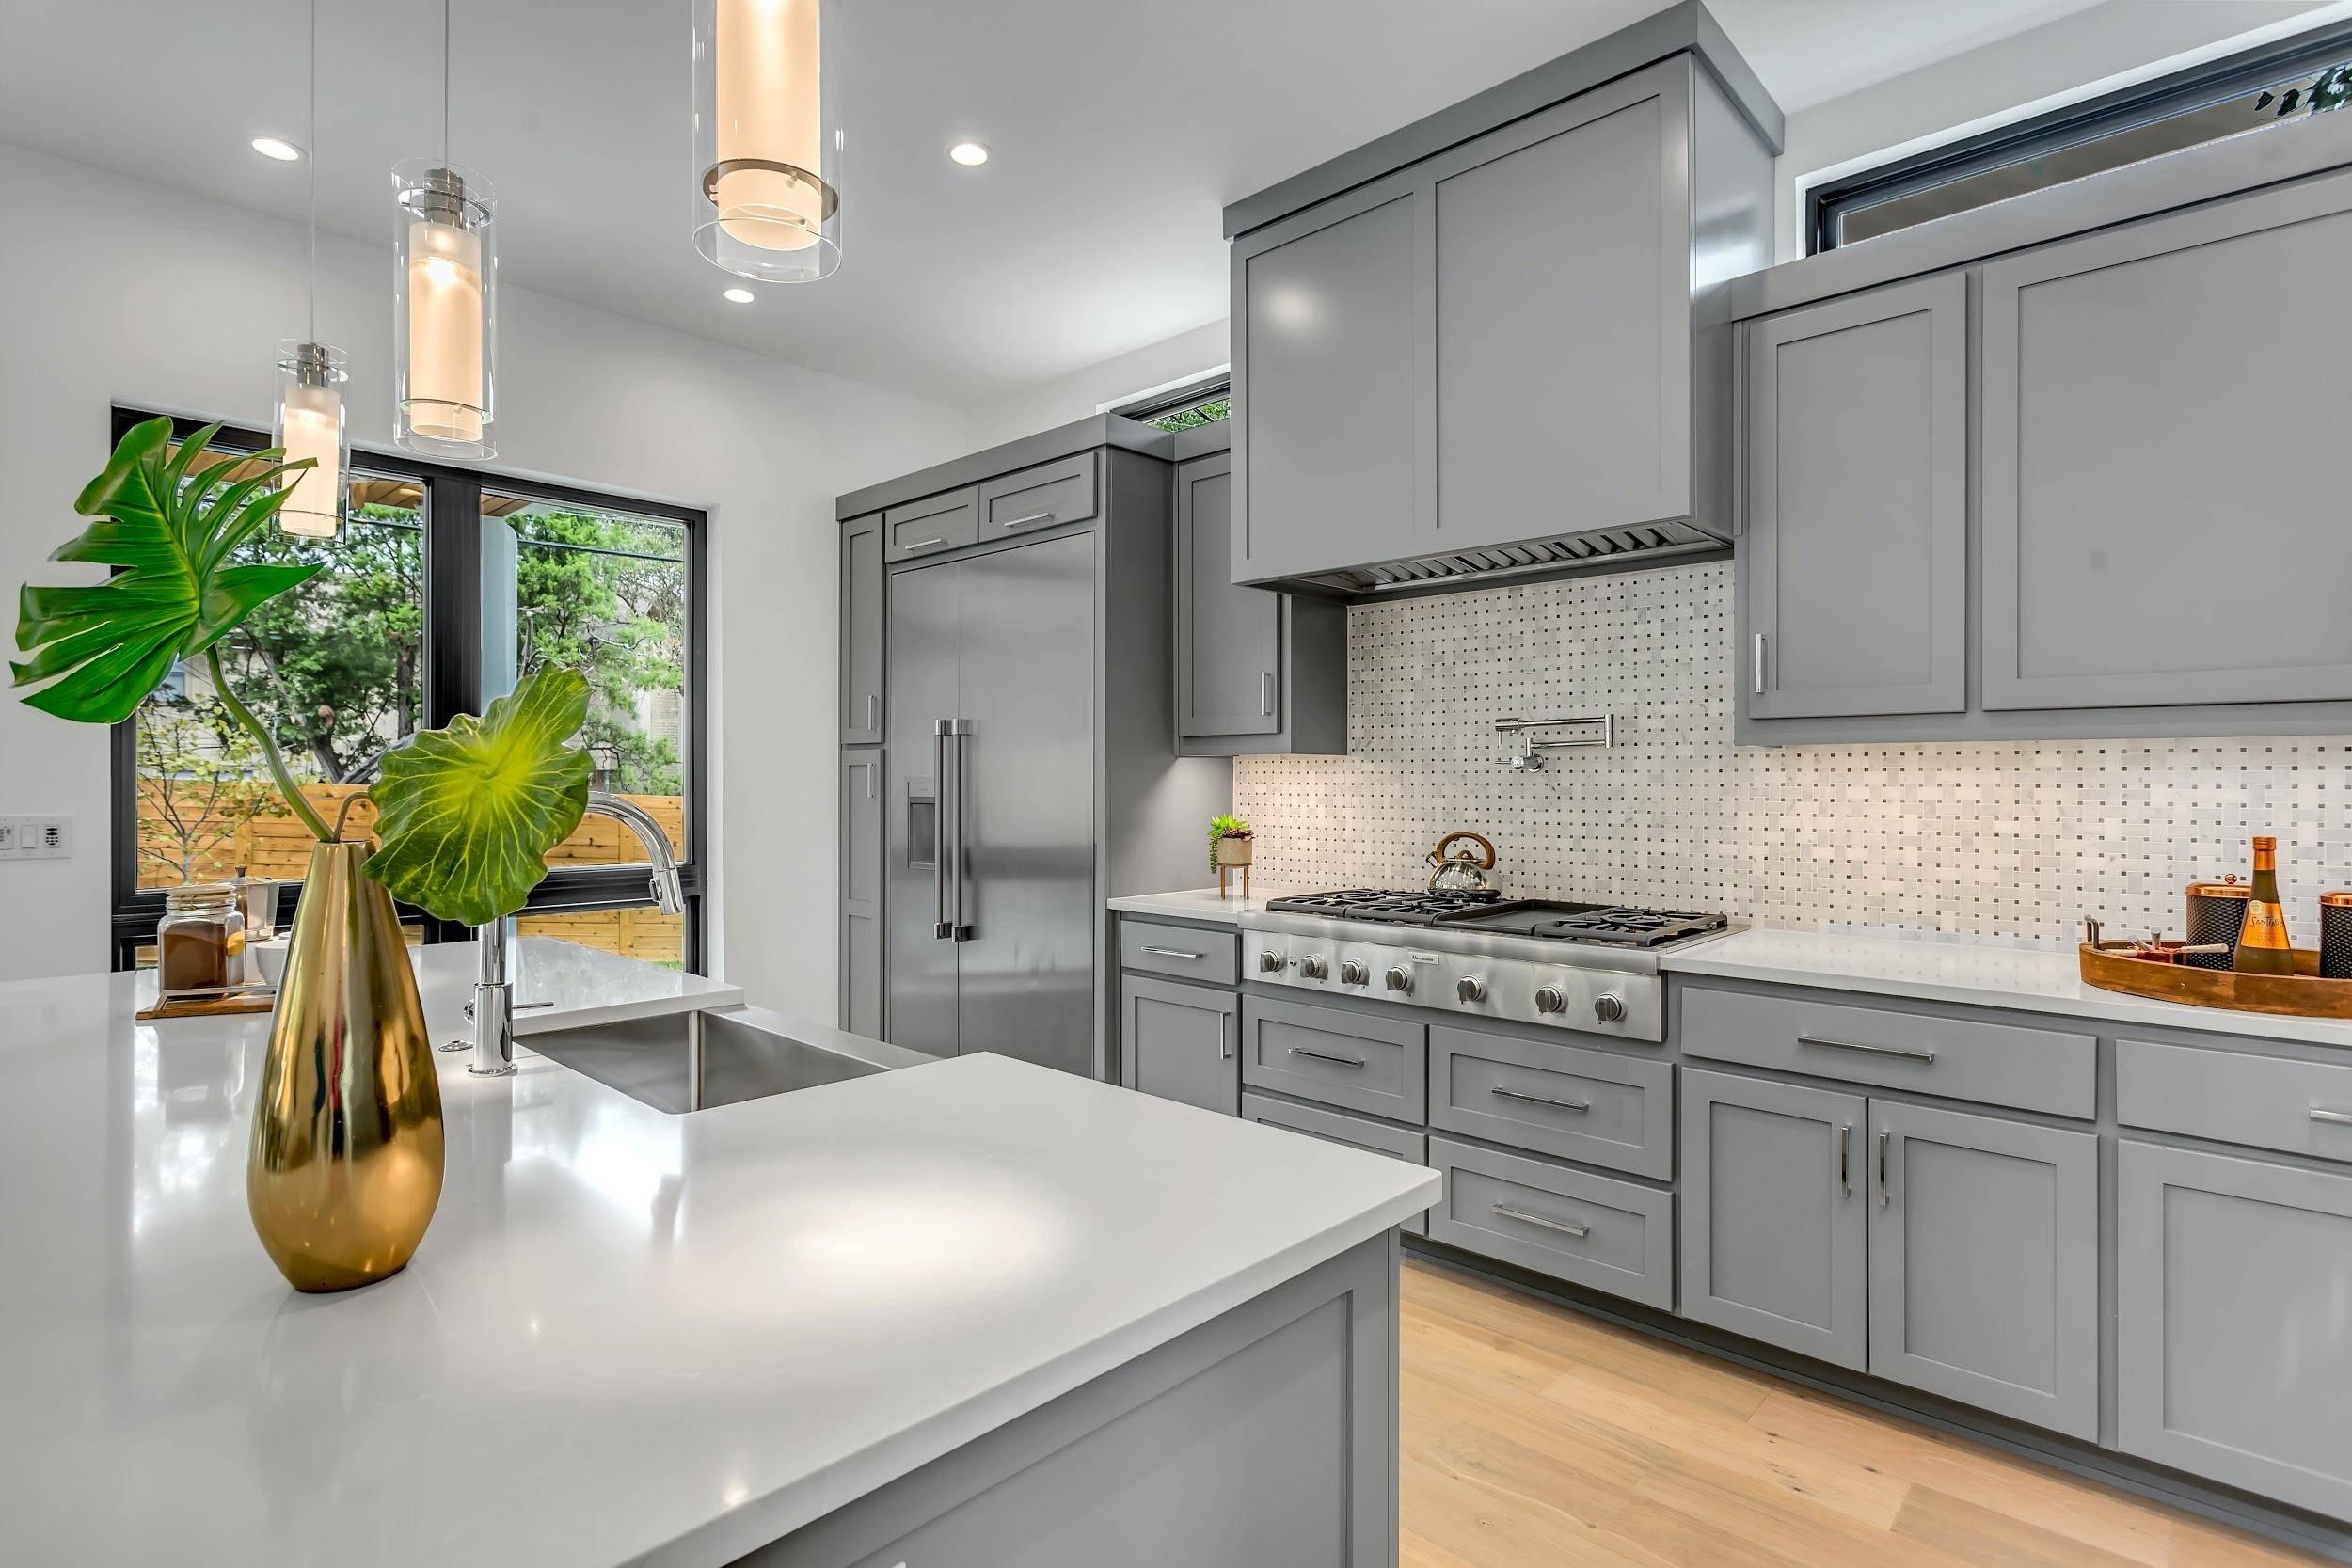 Dove grey granite countertops among shades of grey kitchen decor